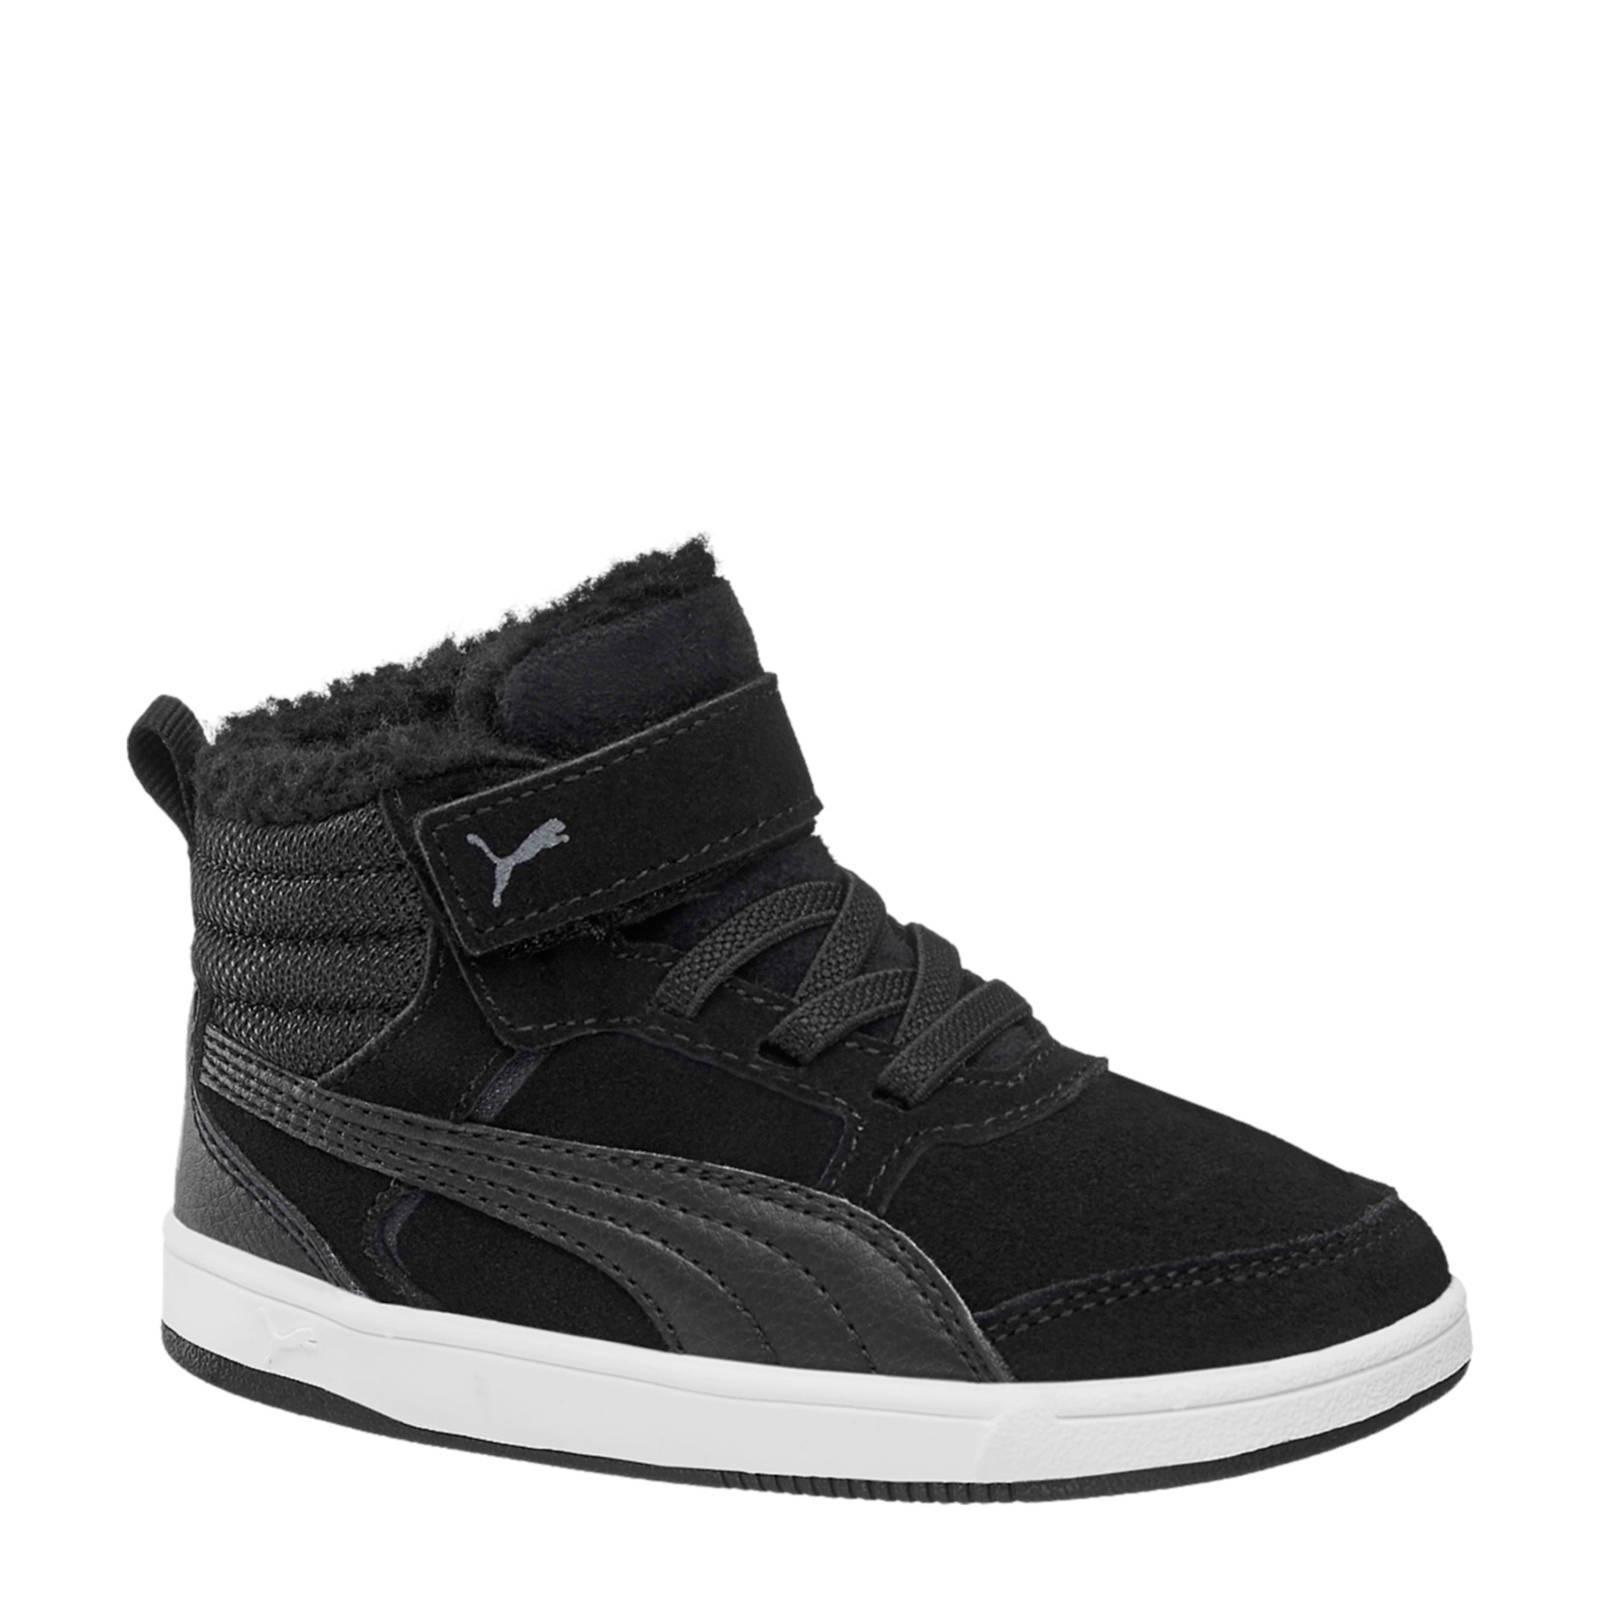 Puma Rebound Street V2 suède sneakers zwart jongens